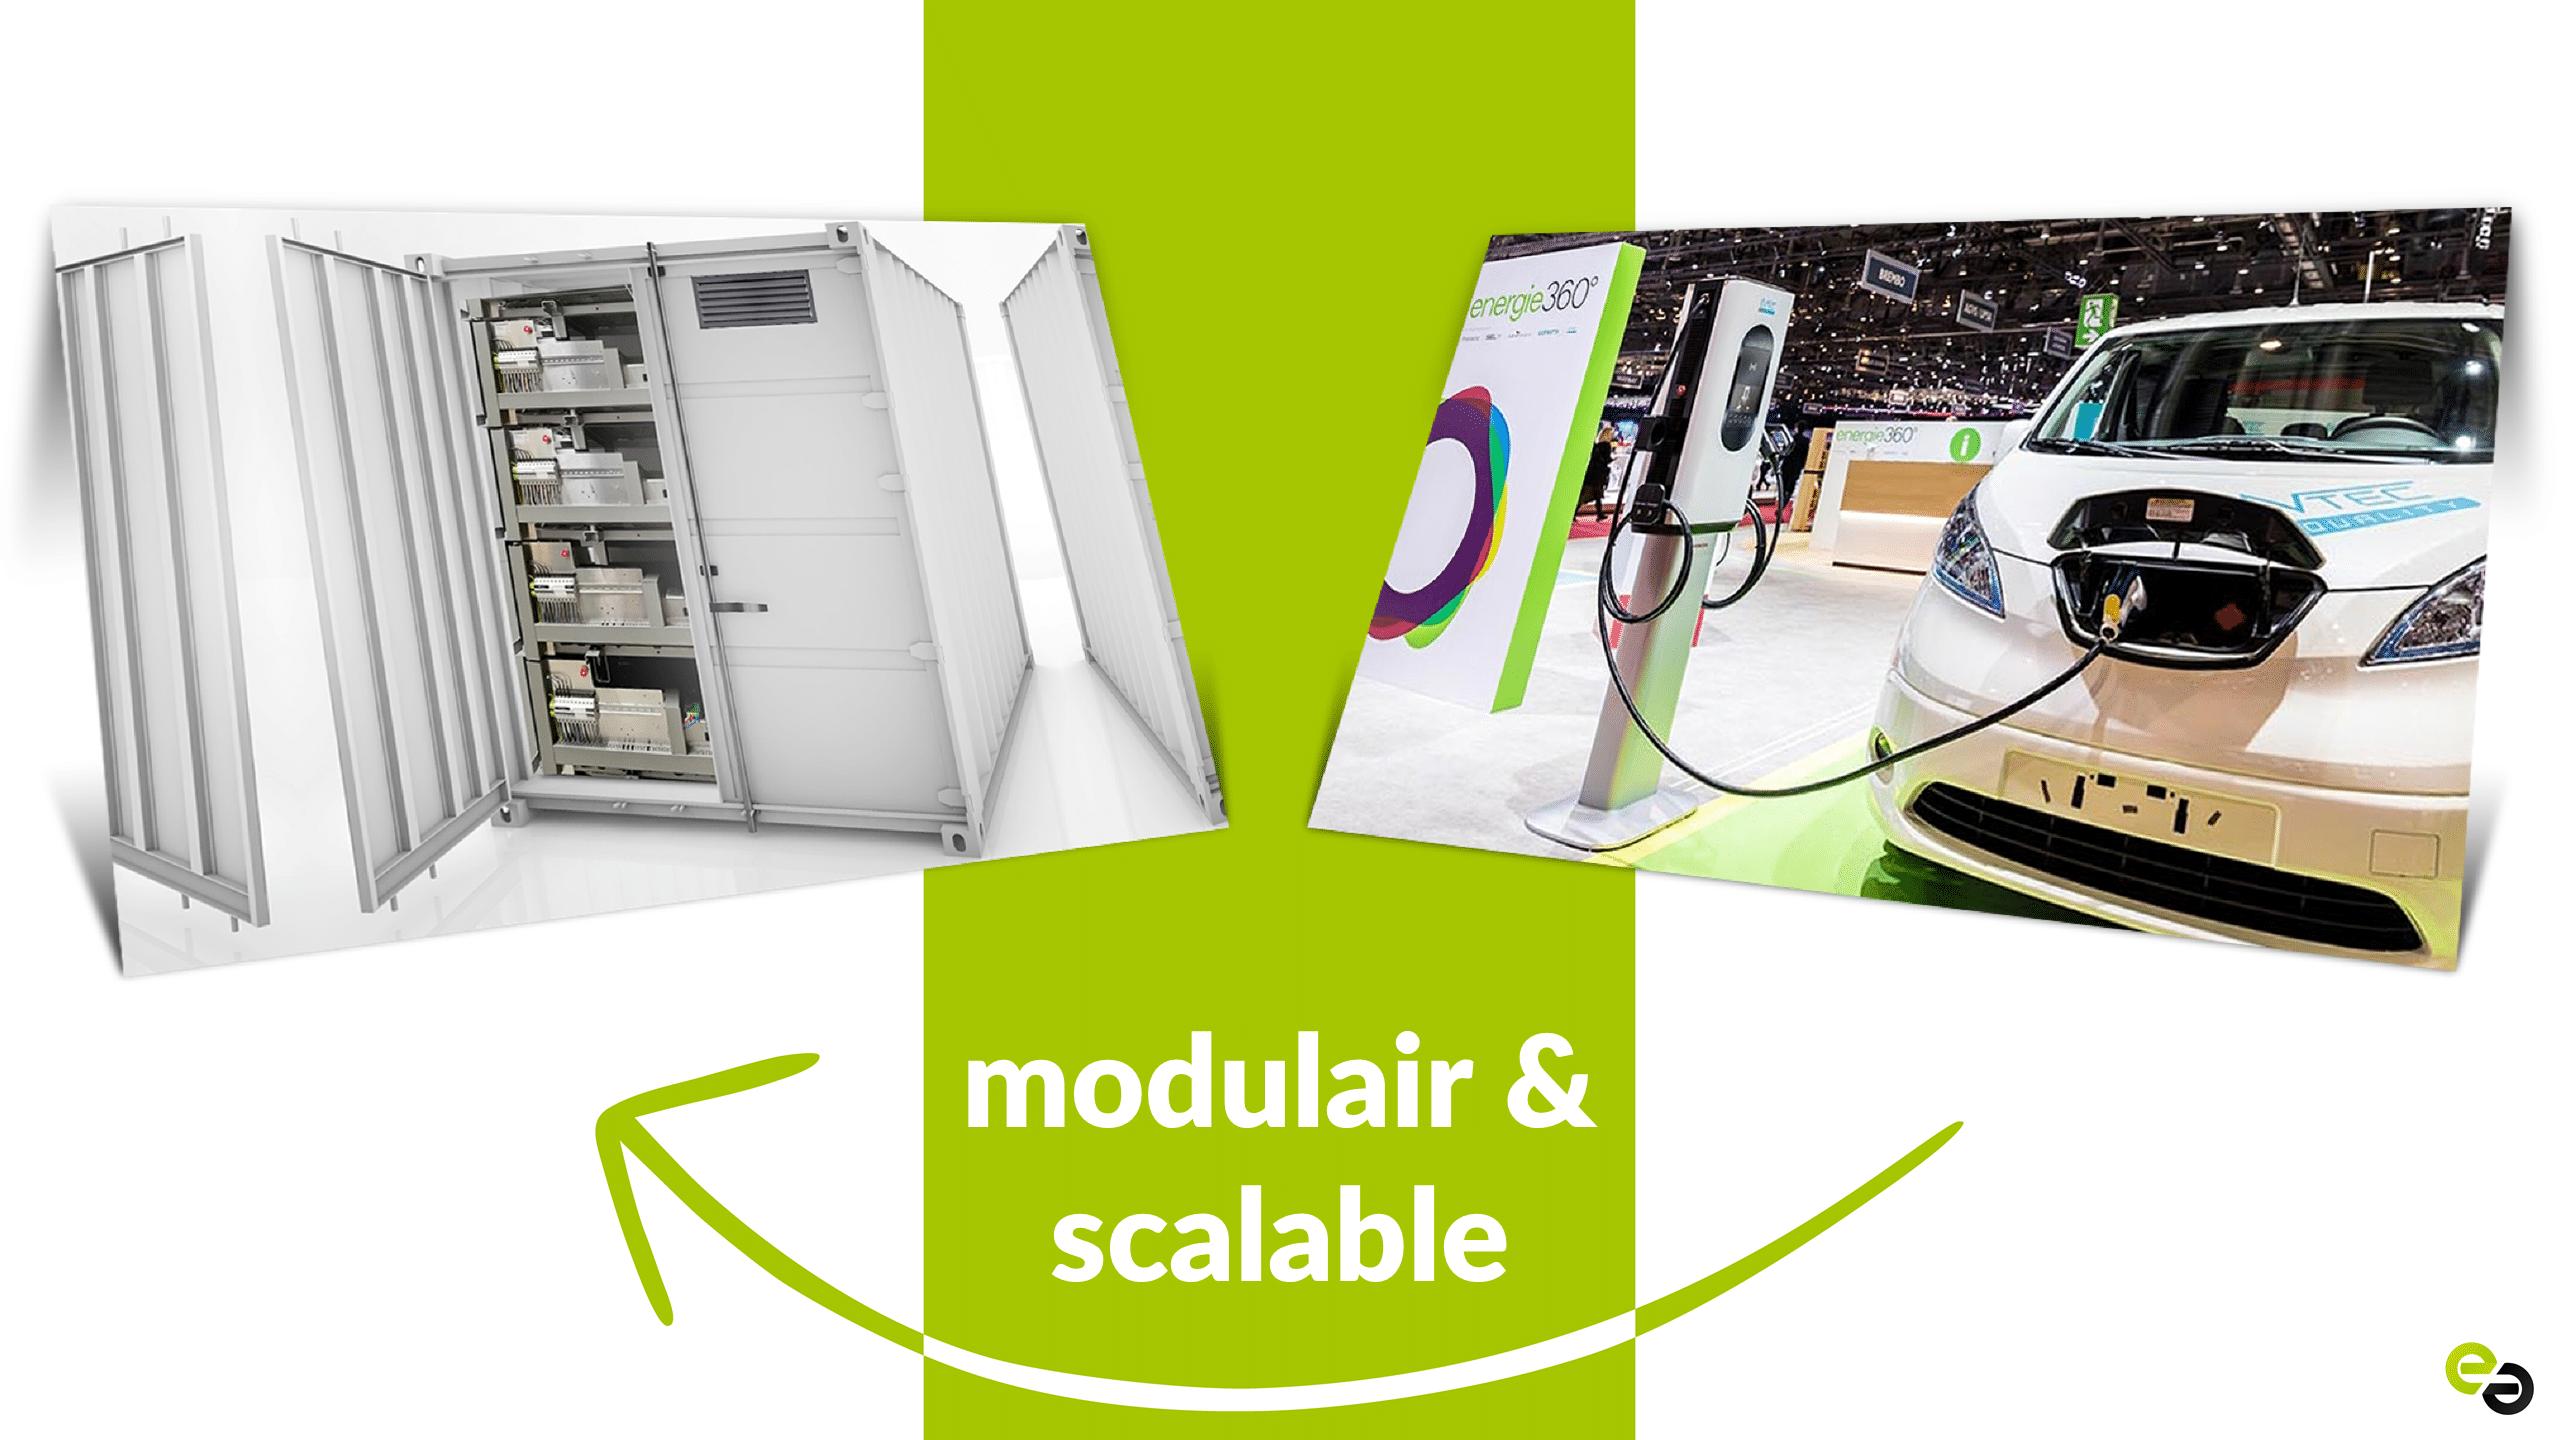 modulair bouwsysteem